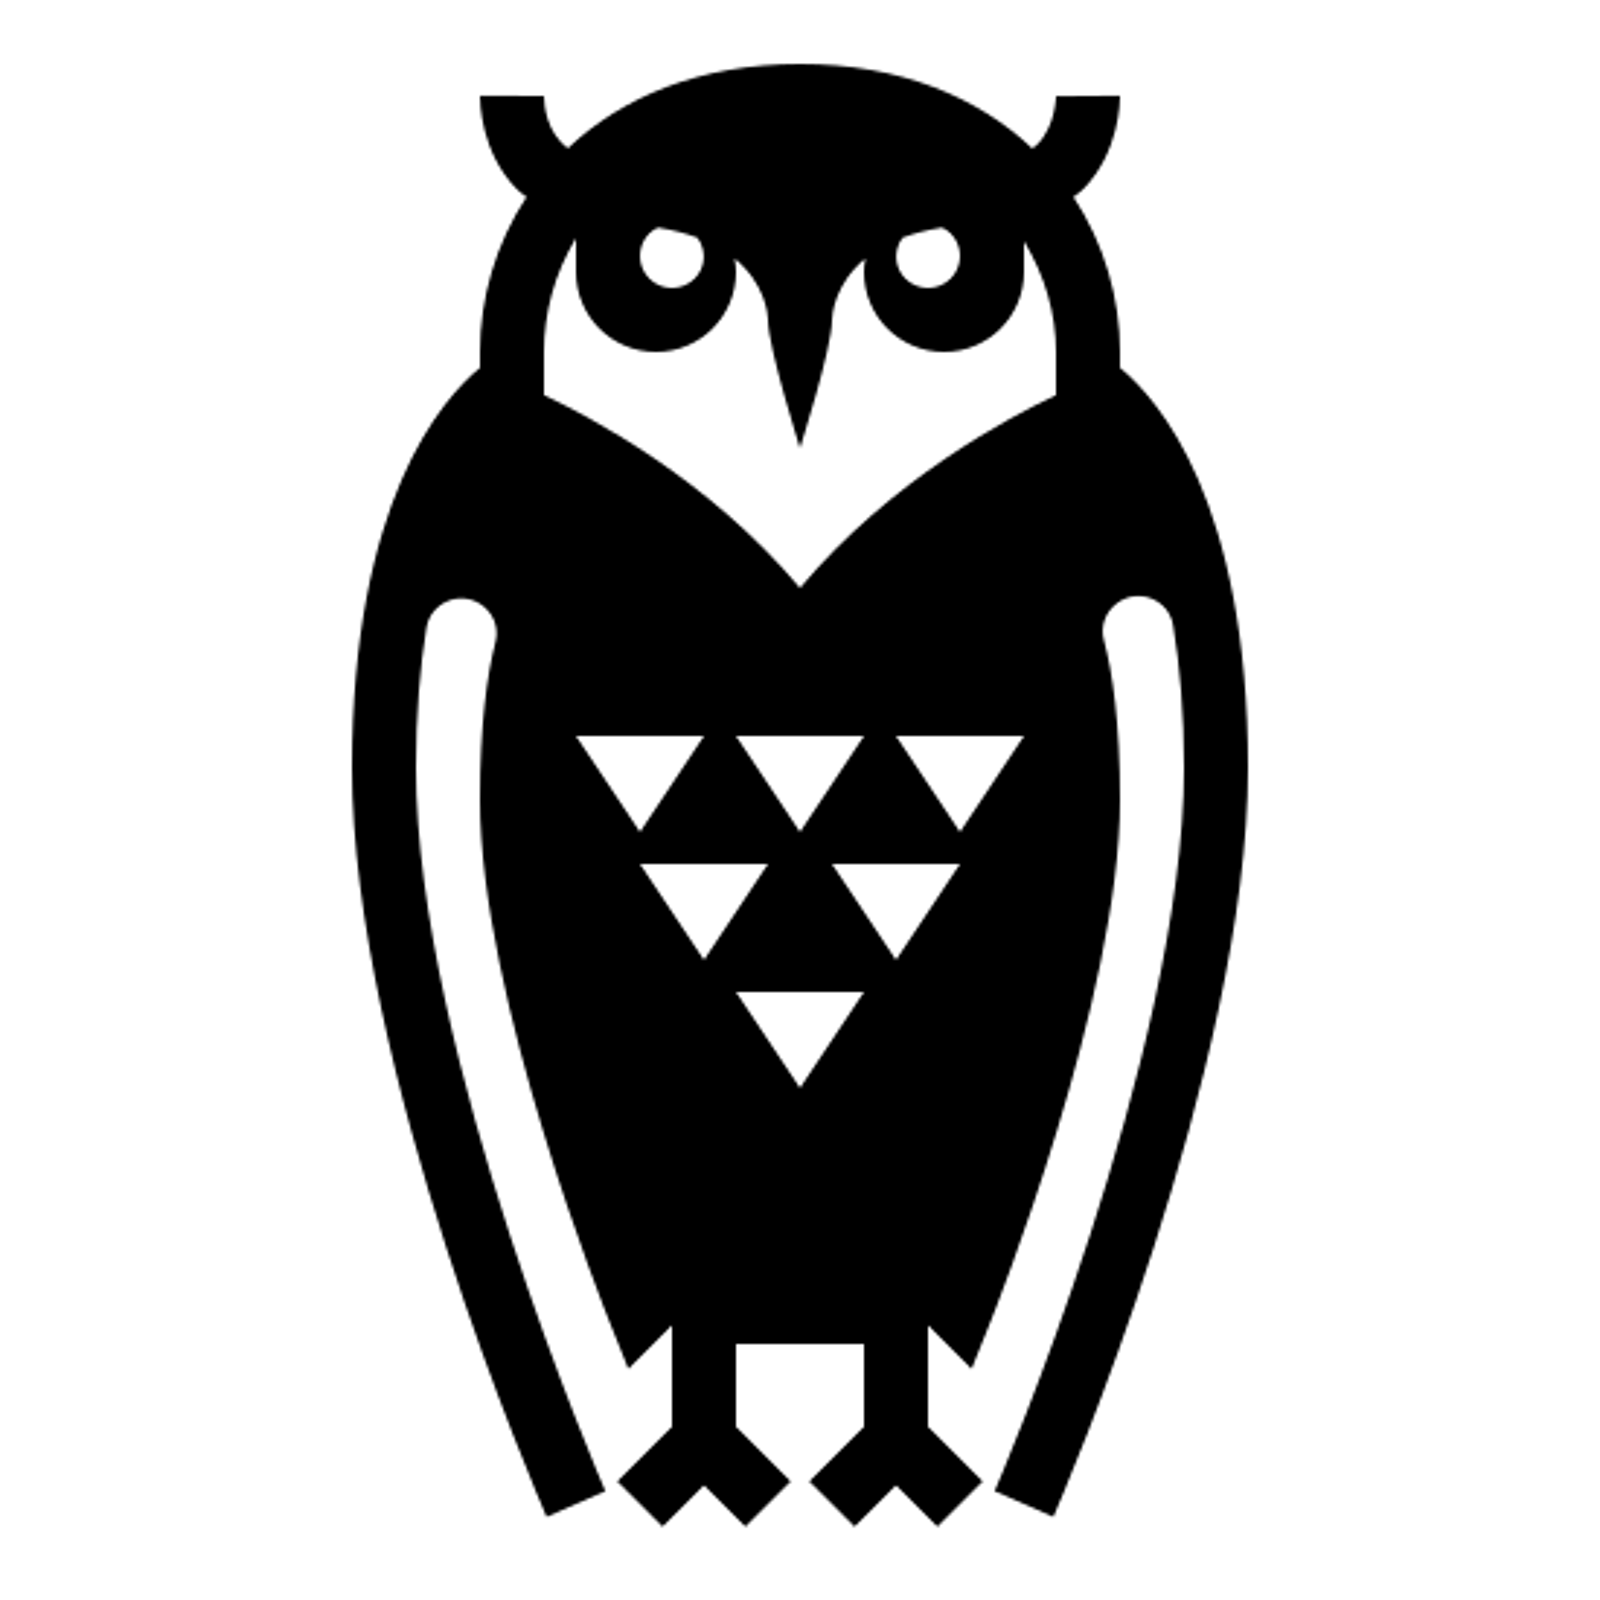 Owl Filled icon